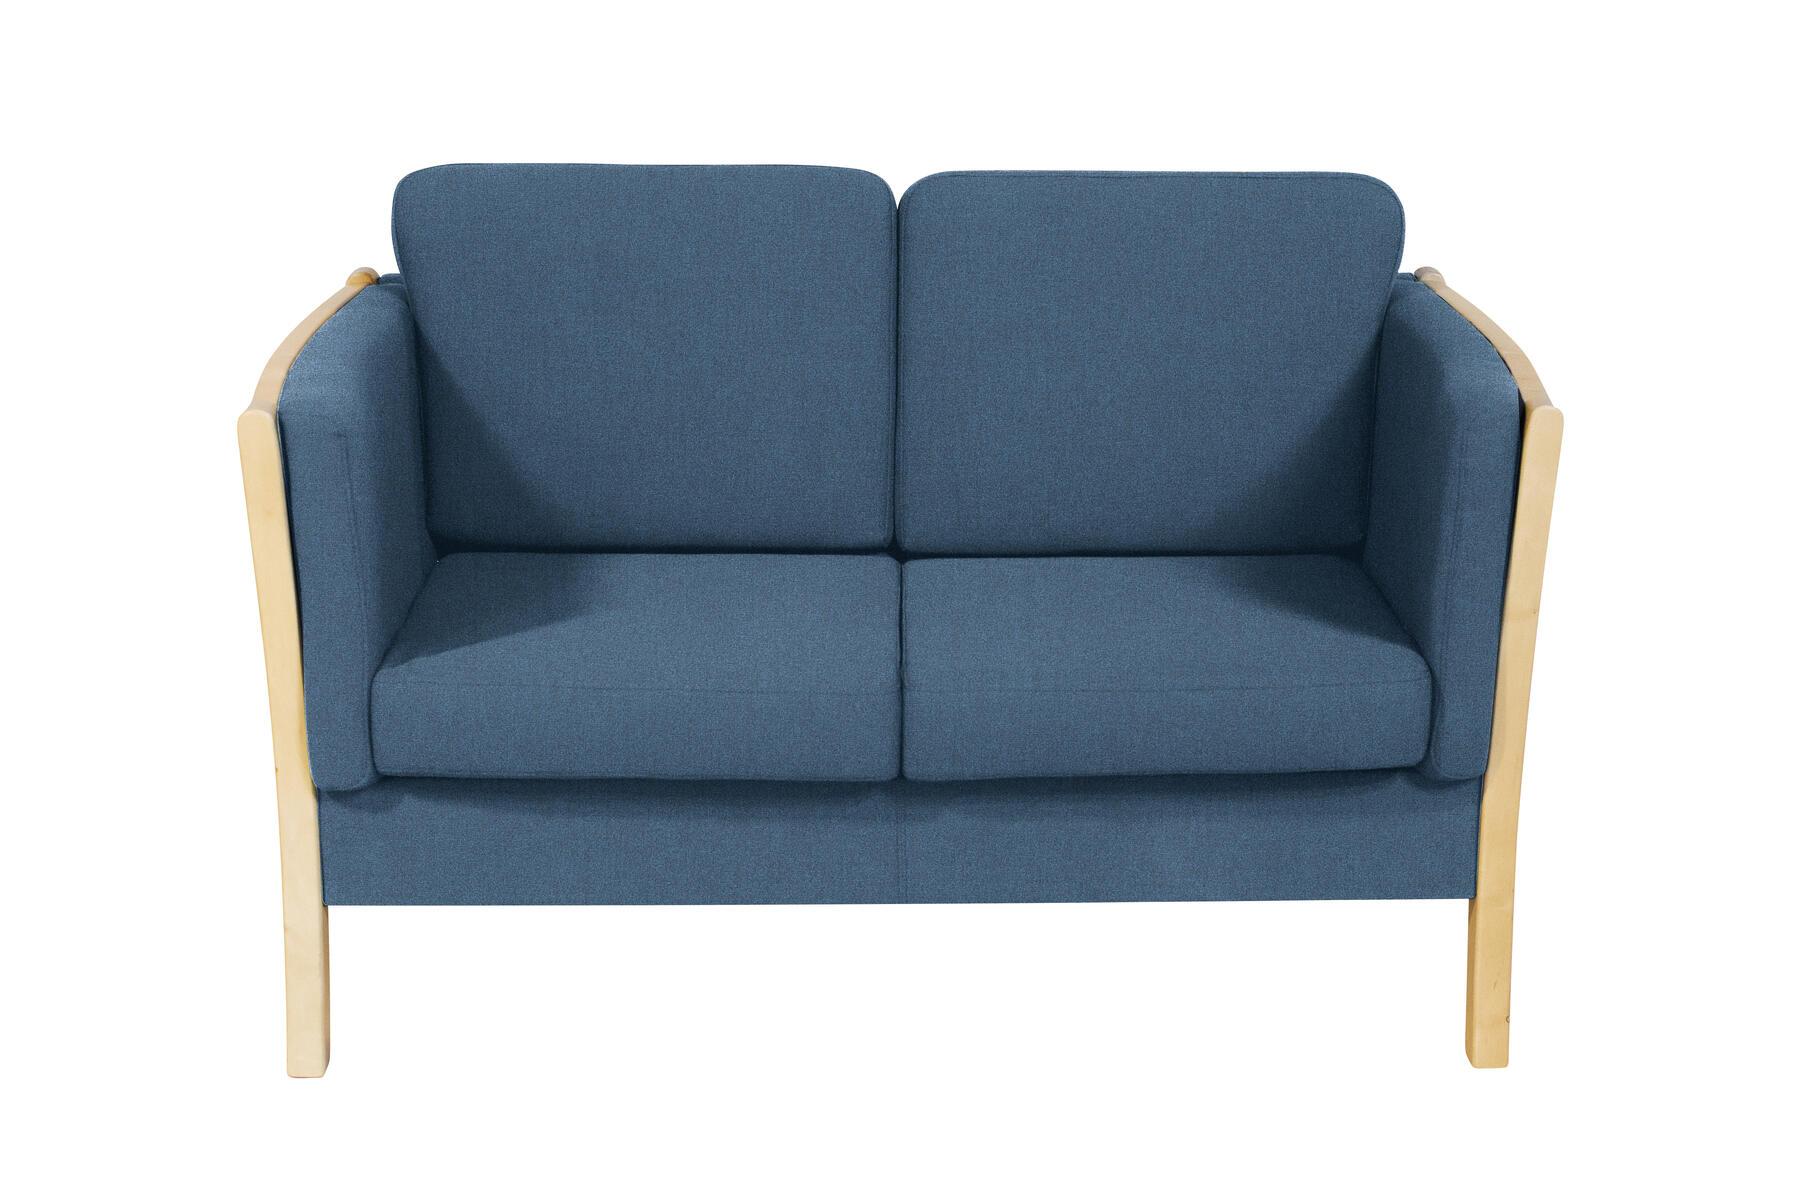 Sofa London 3-seter velg stoff - Lekolar Norge